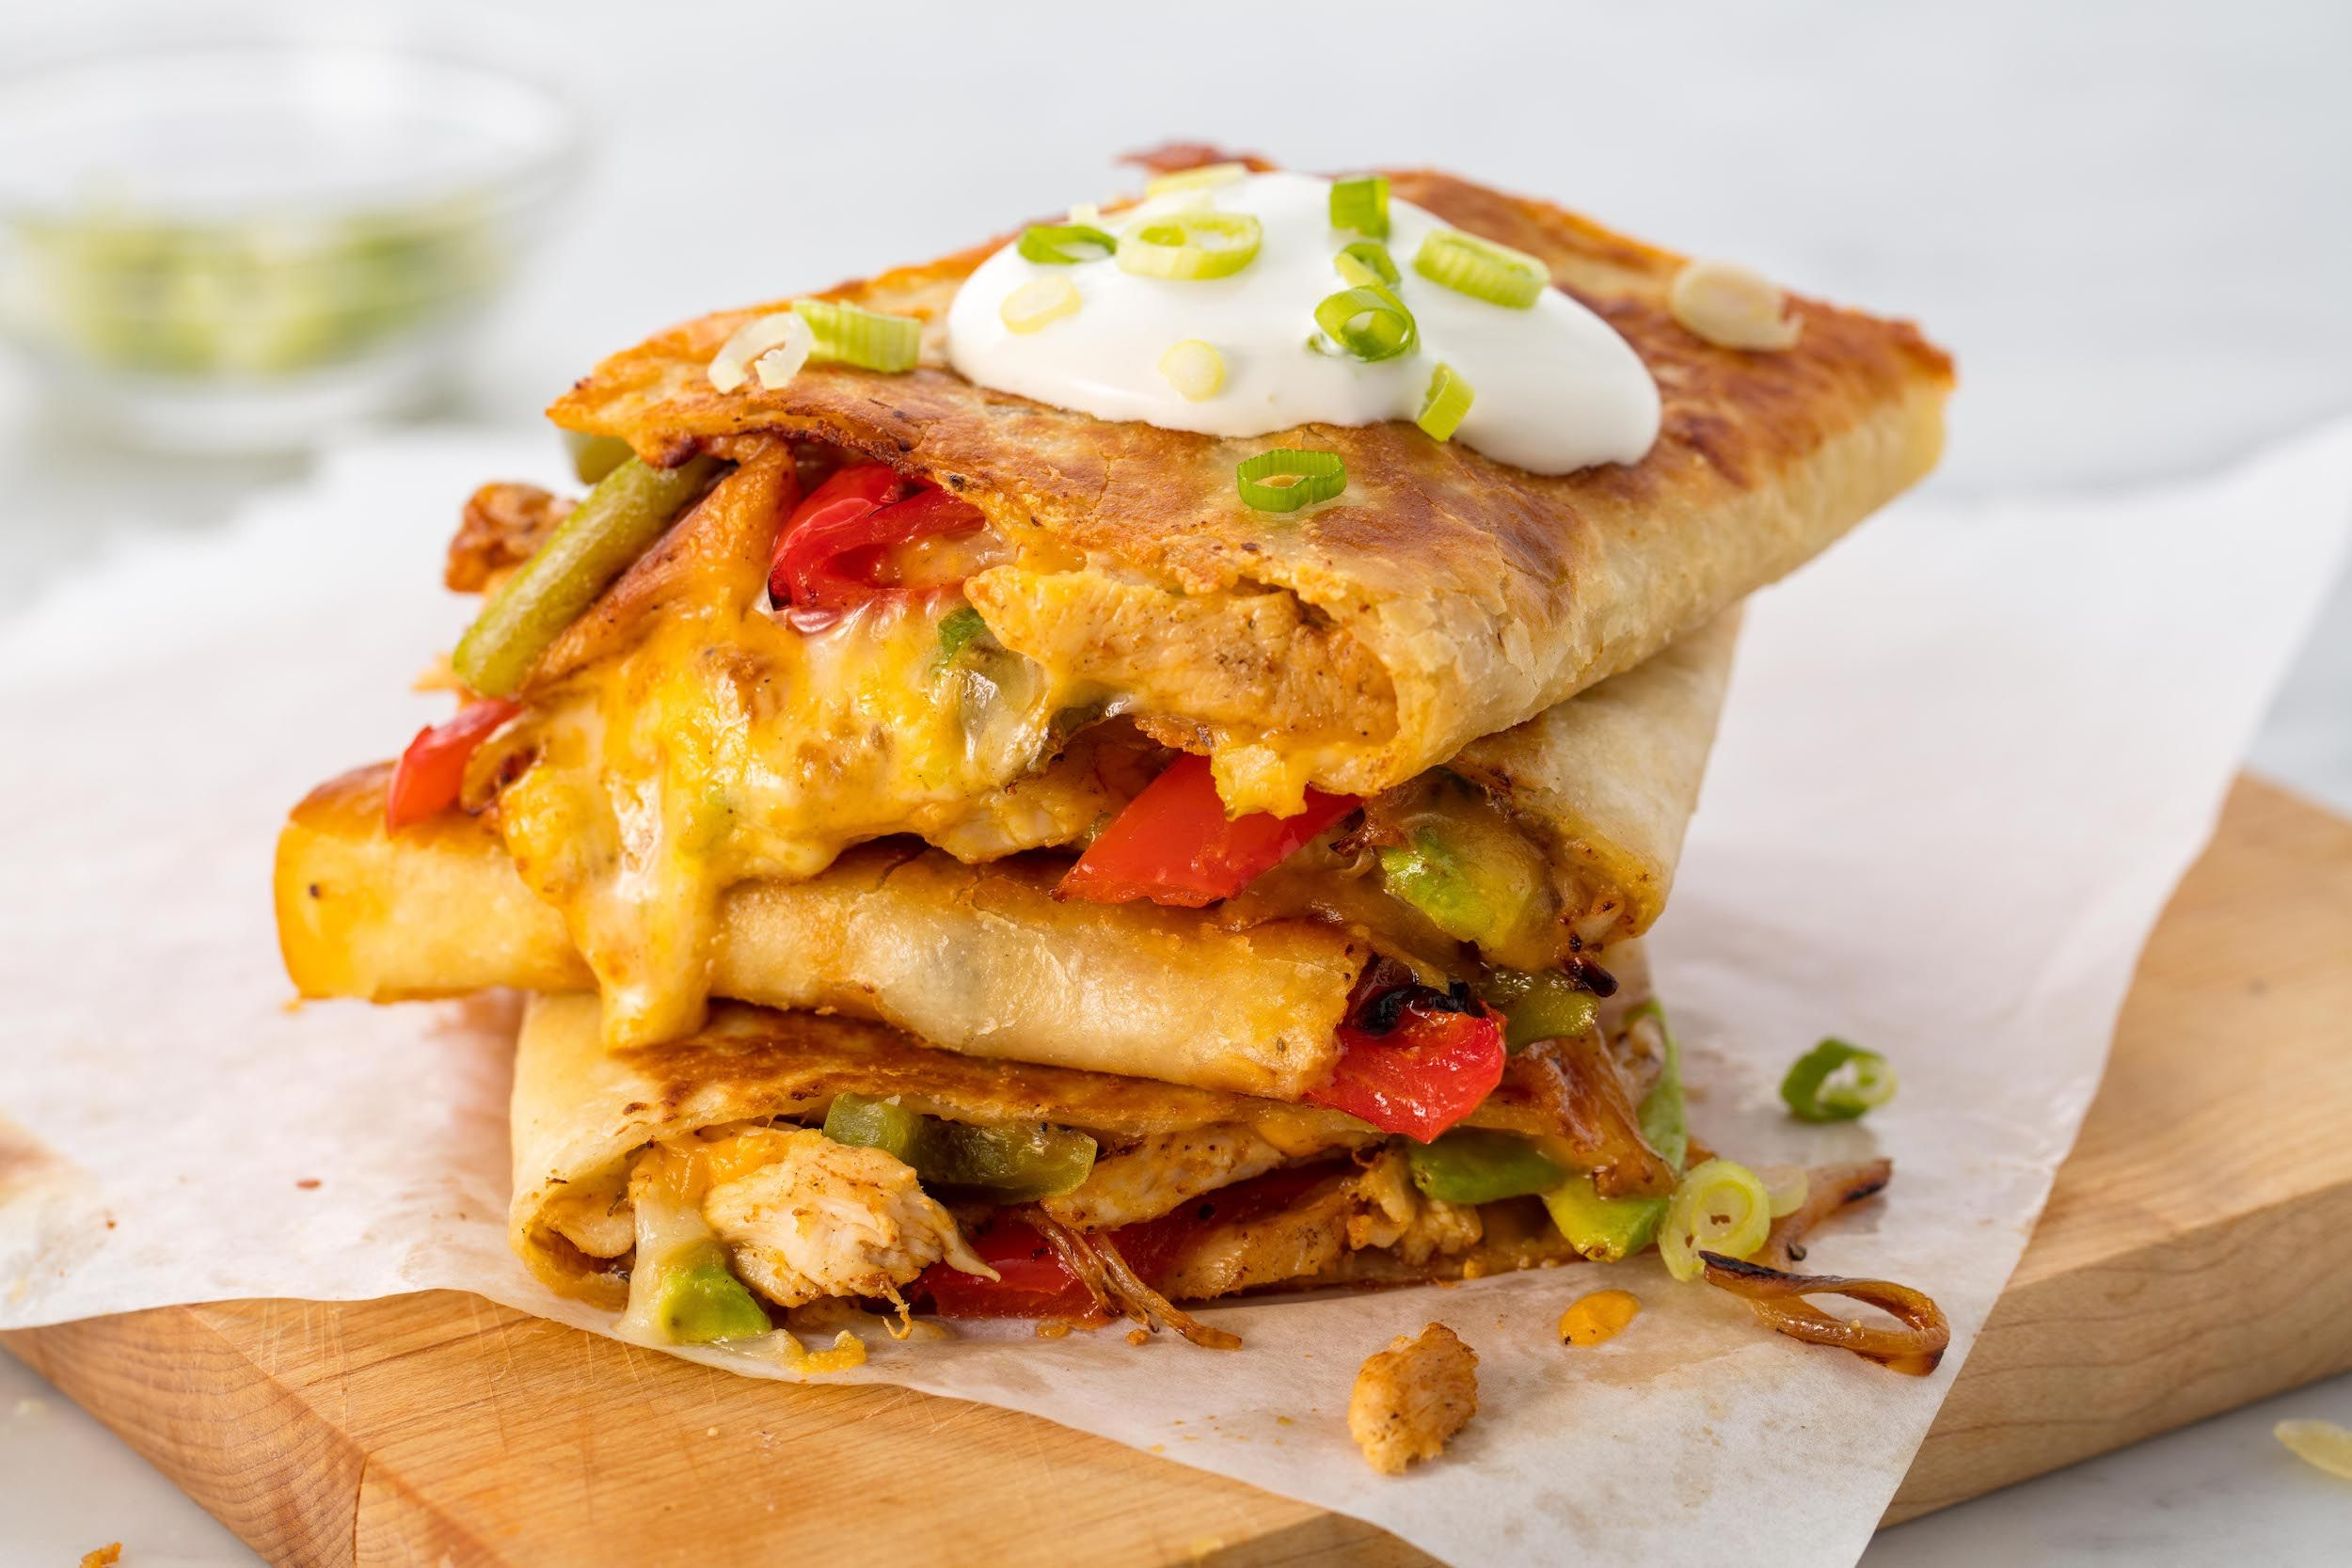 Easy Chicken Quesadilla Recipe How To Make The Best Chicken Quesadillas